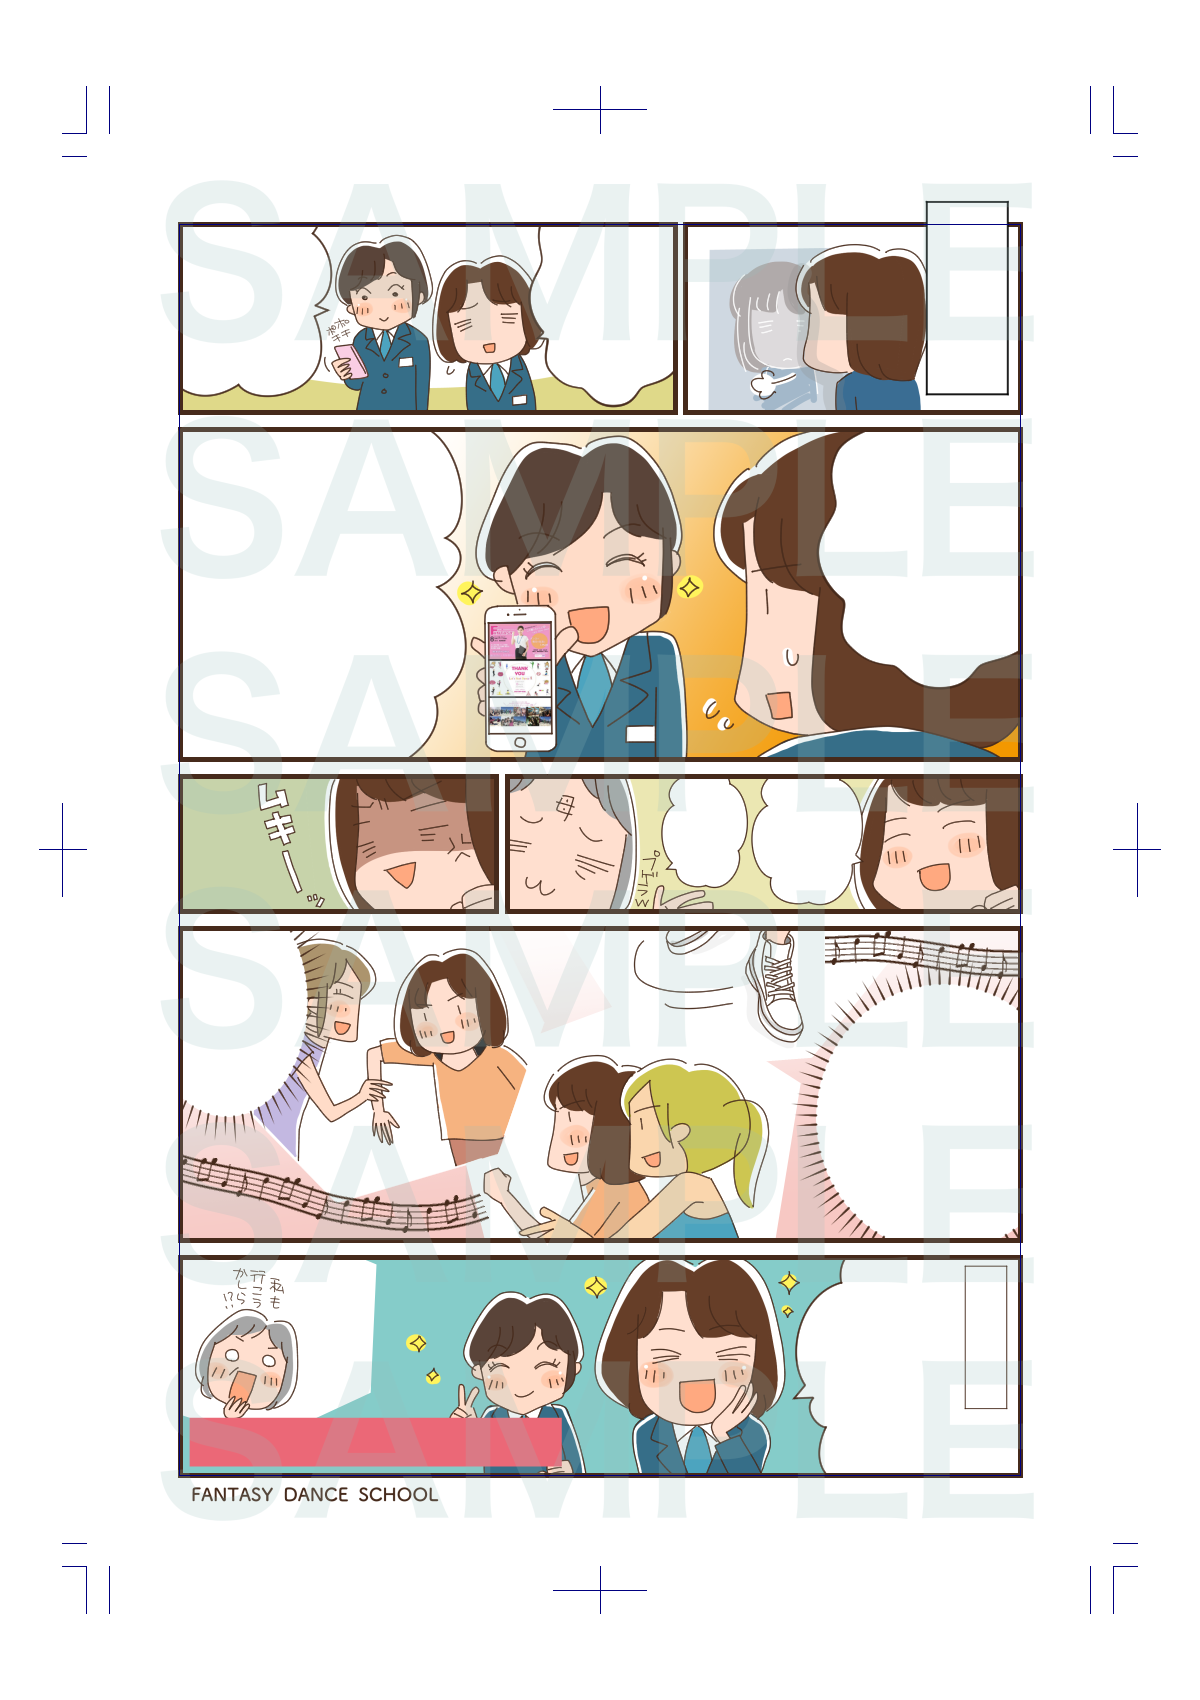 FANTASY DANCE SCHOOL 様 / 1ページ漫画